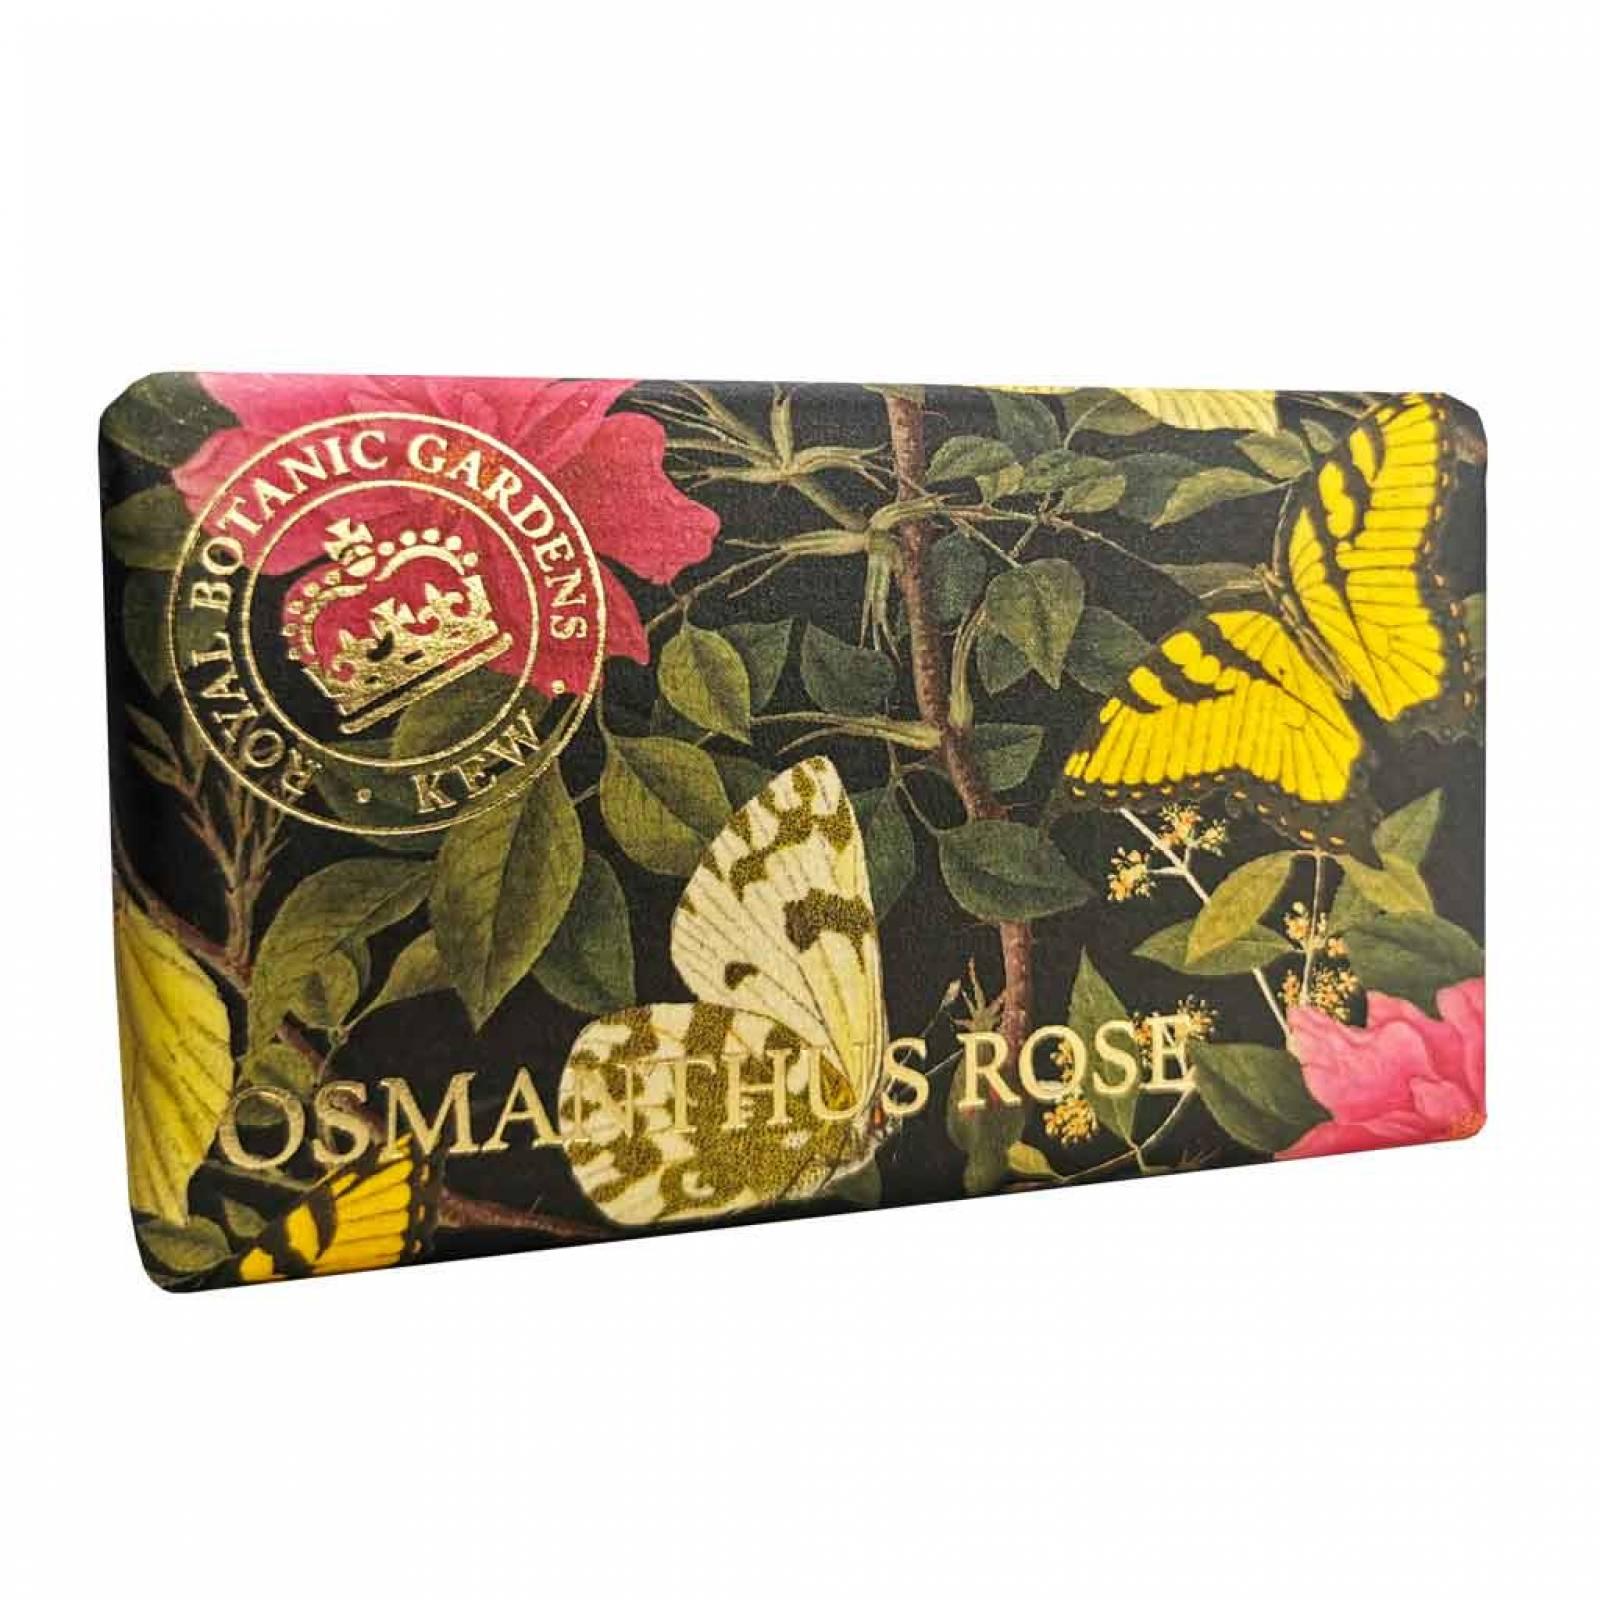 Osmanthus Rose Kew Gardens Soap 240g